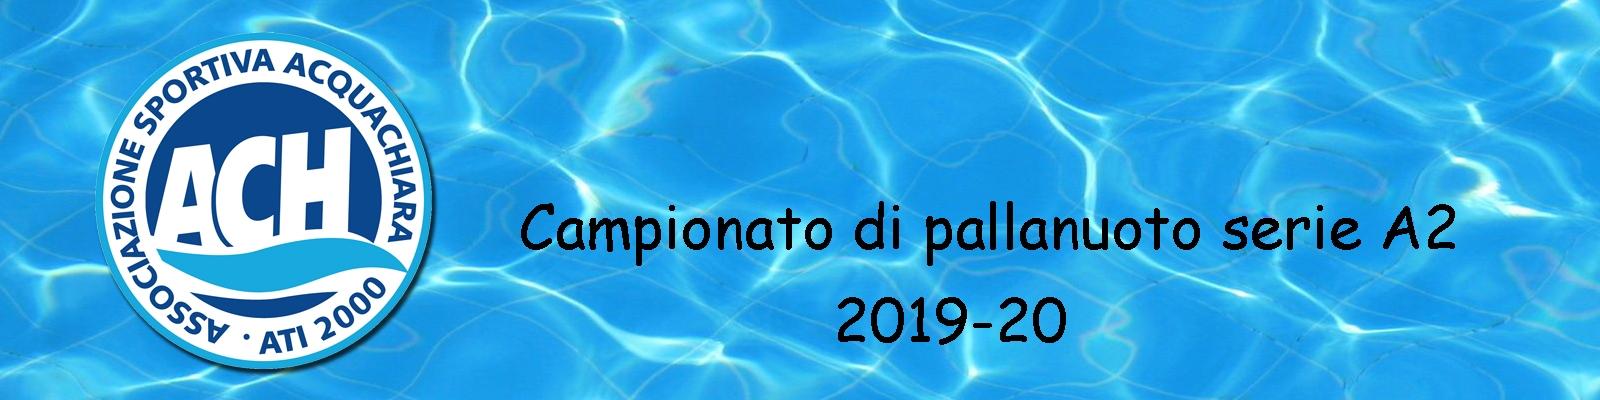 Acquachiara anno 2019-20